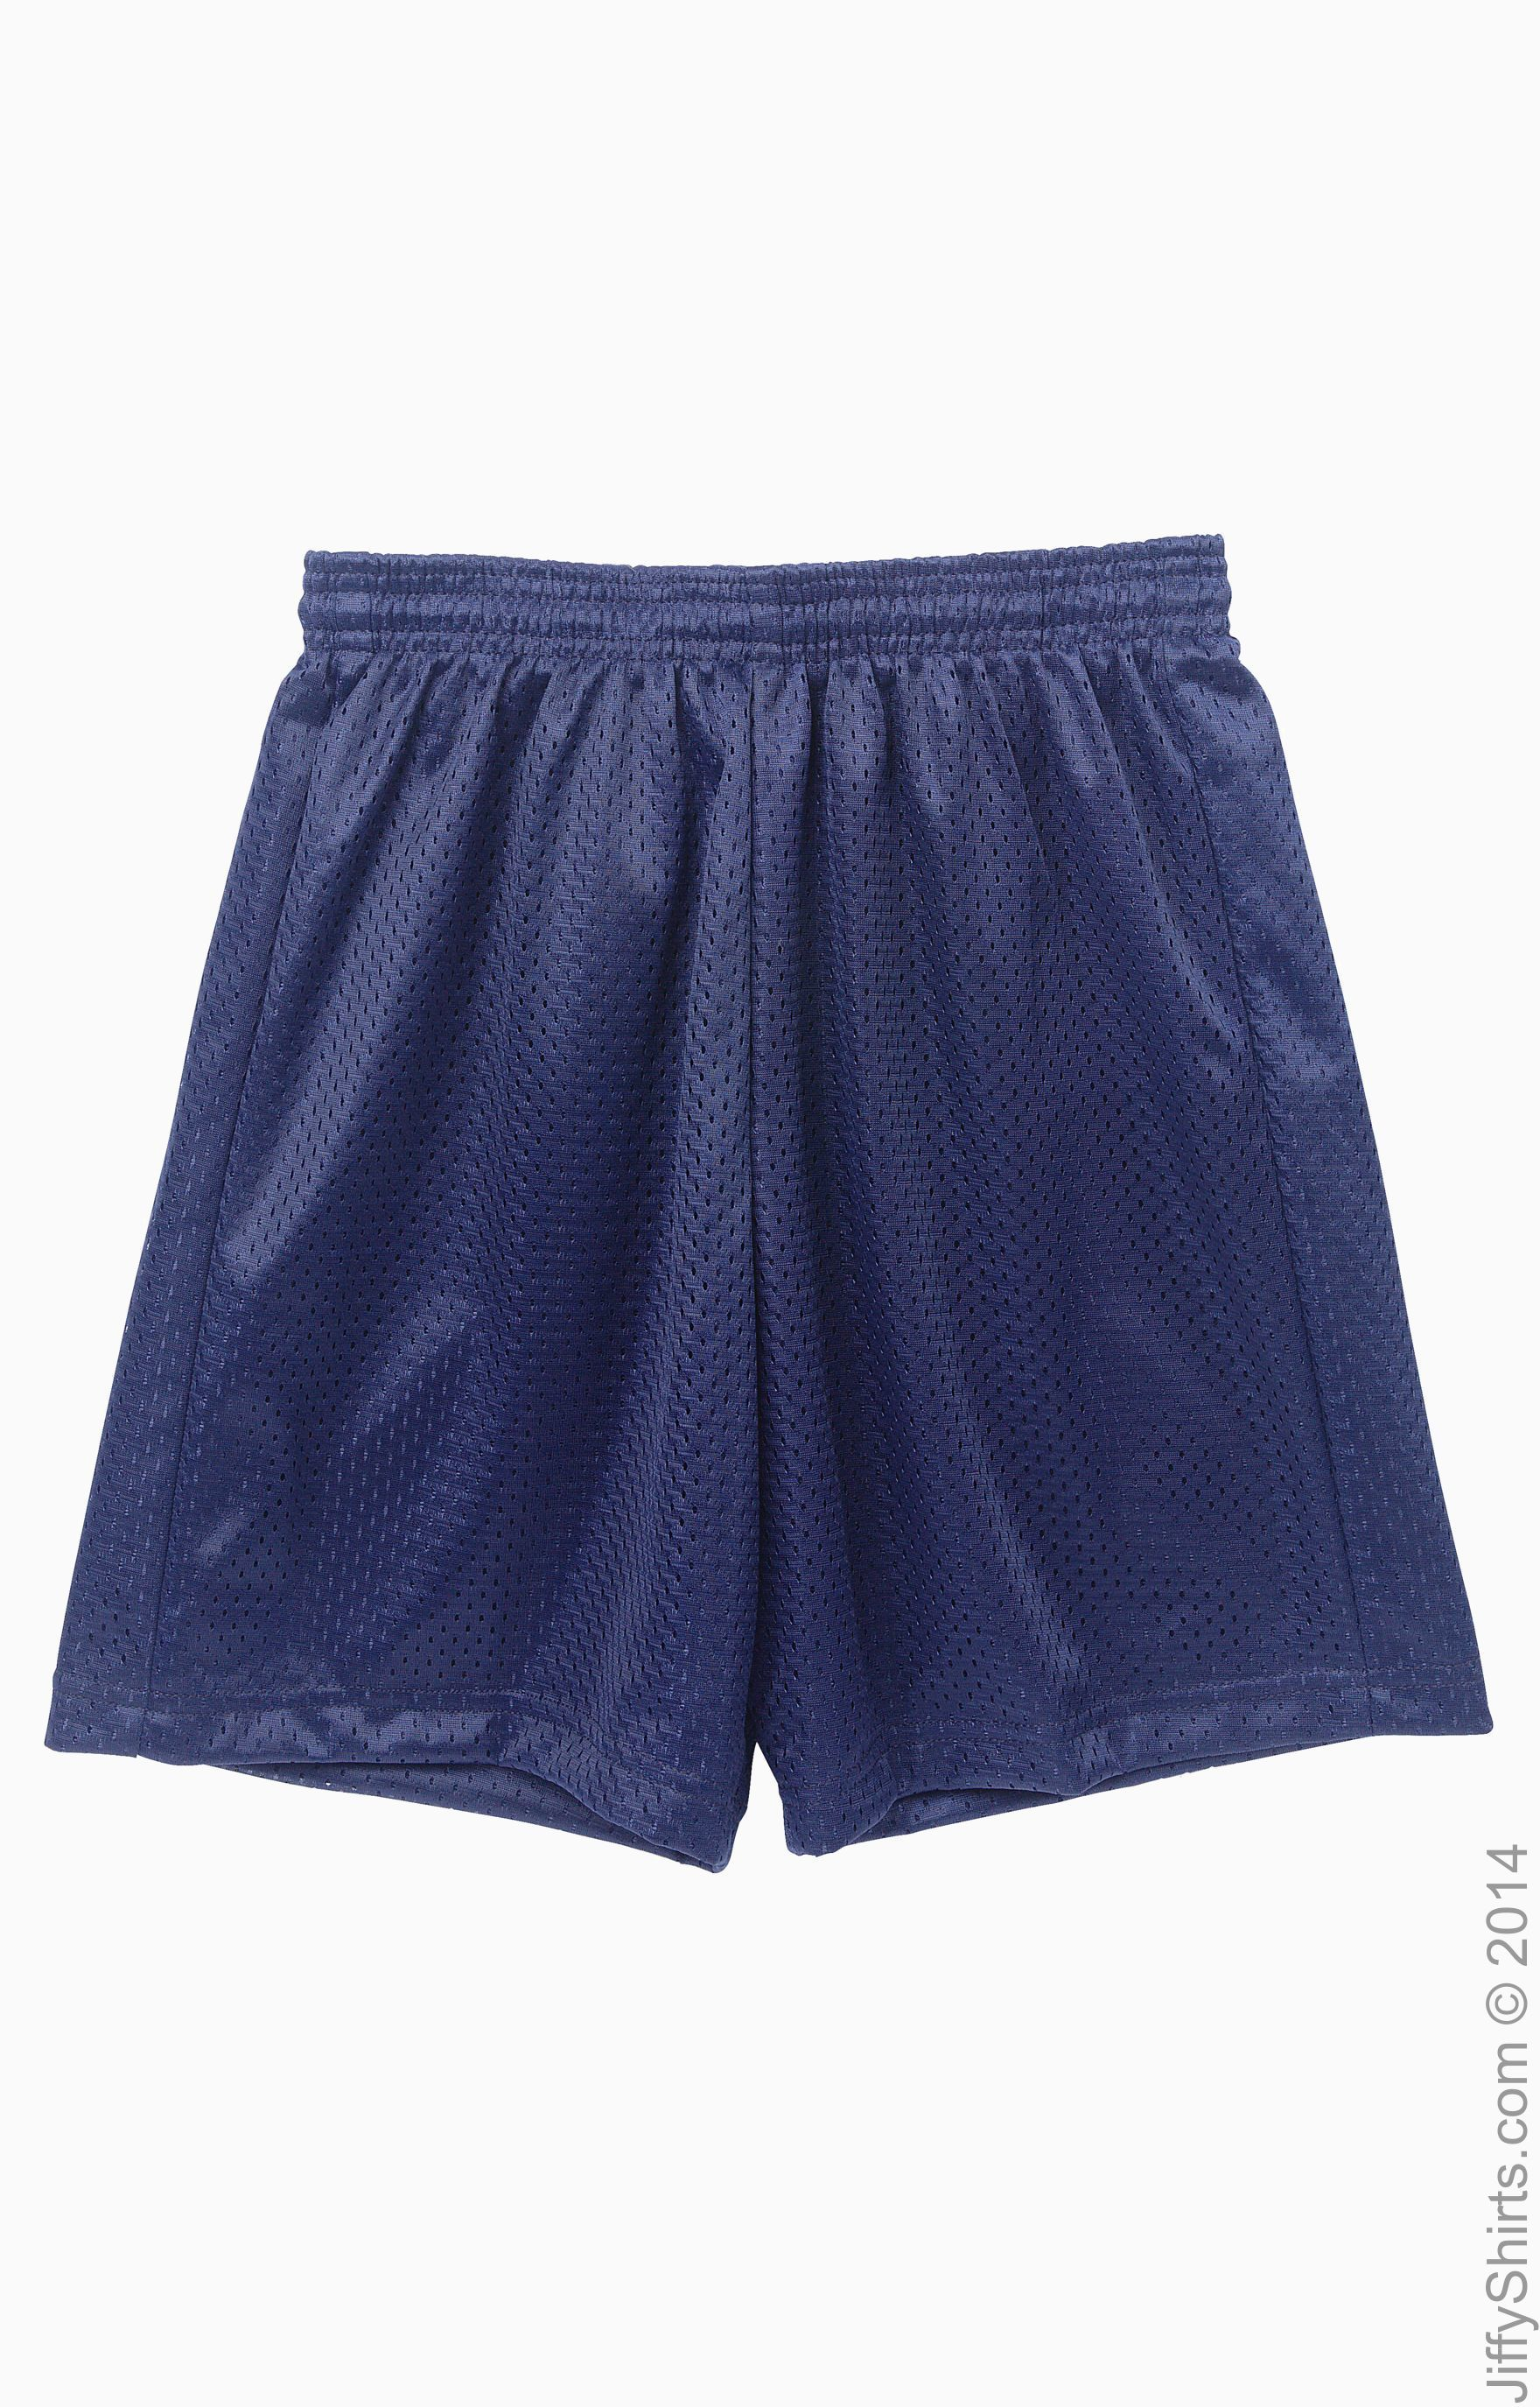 NEW Boys Shorts Size Medium 8-10 Solid Blue Casual Basketball Sports Gym PE